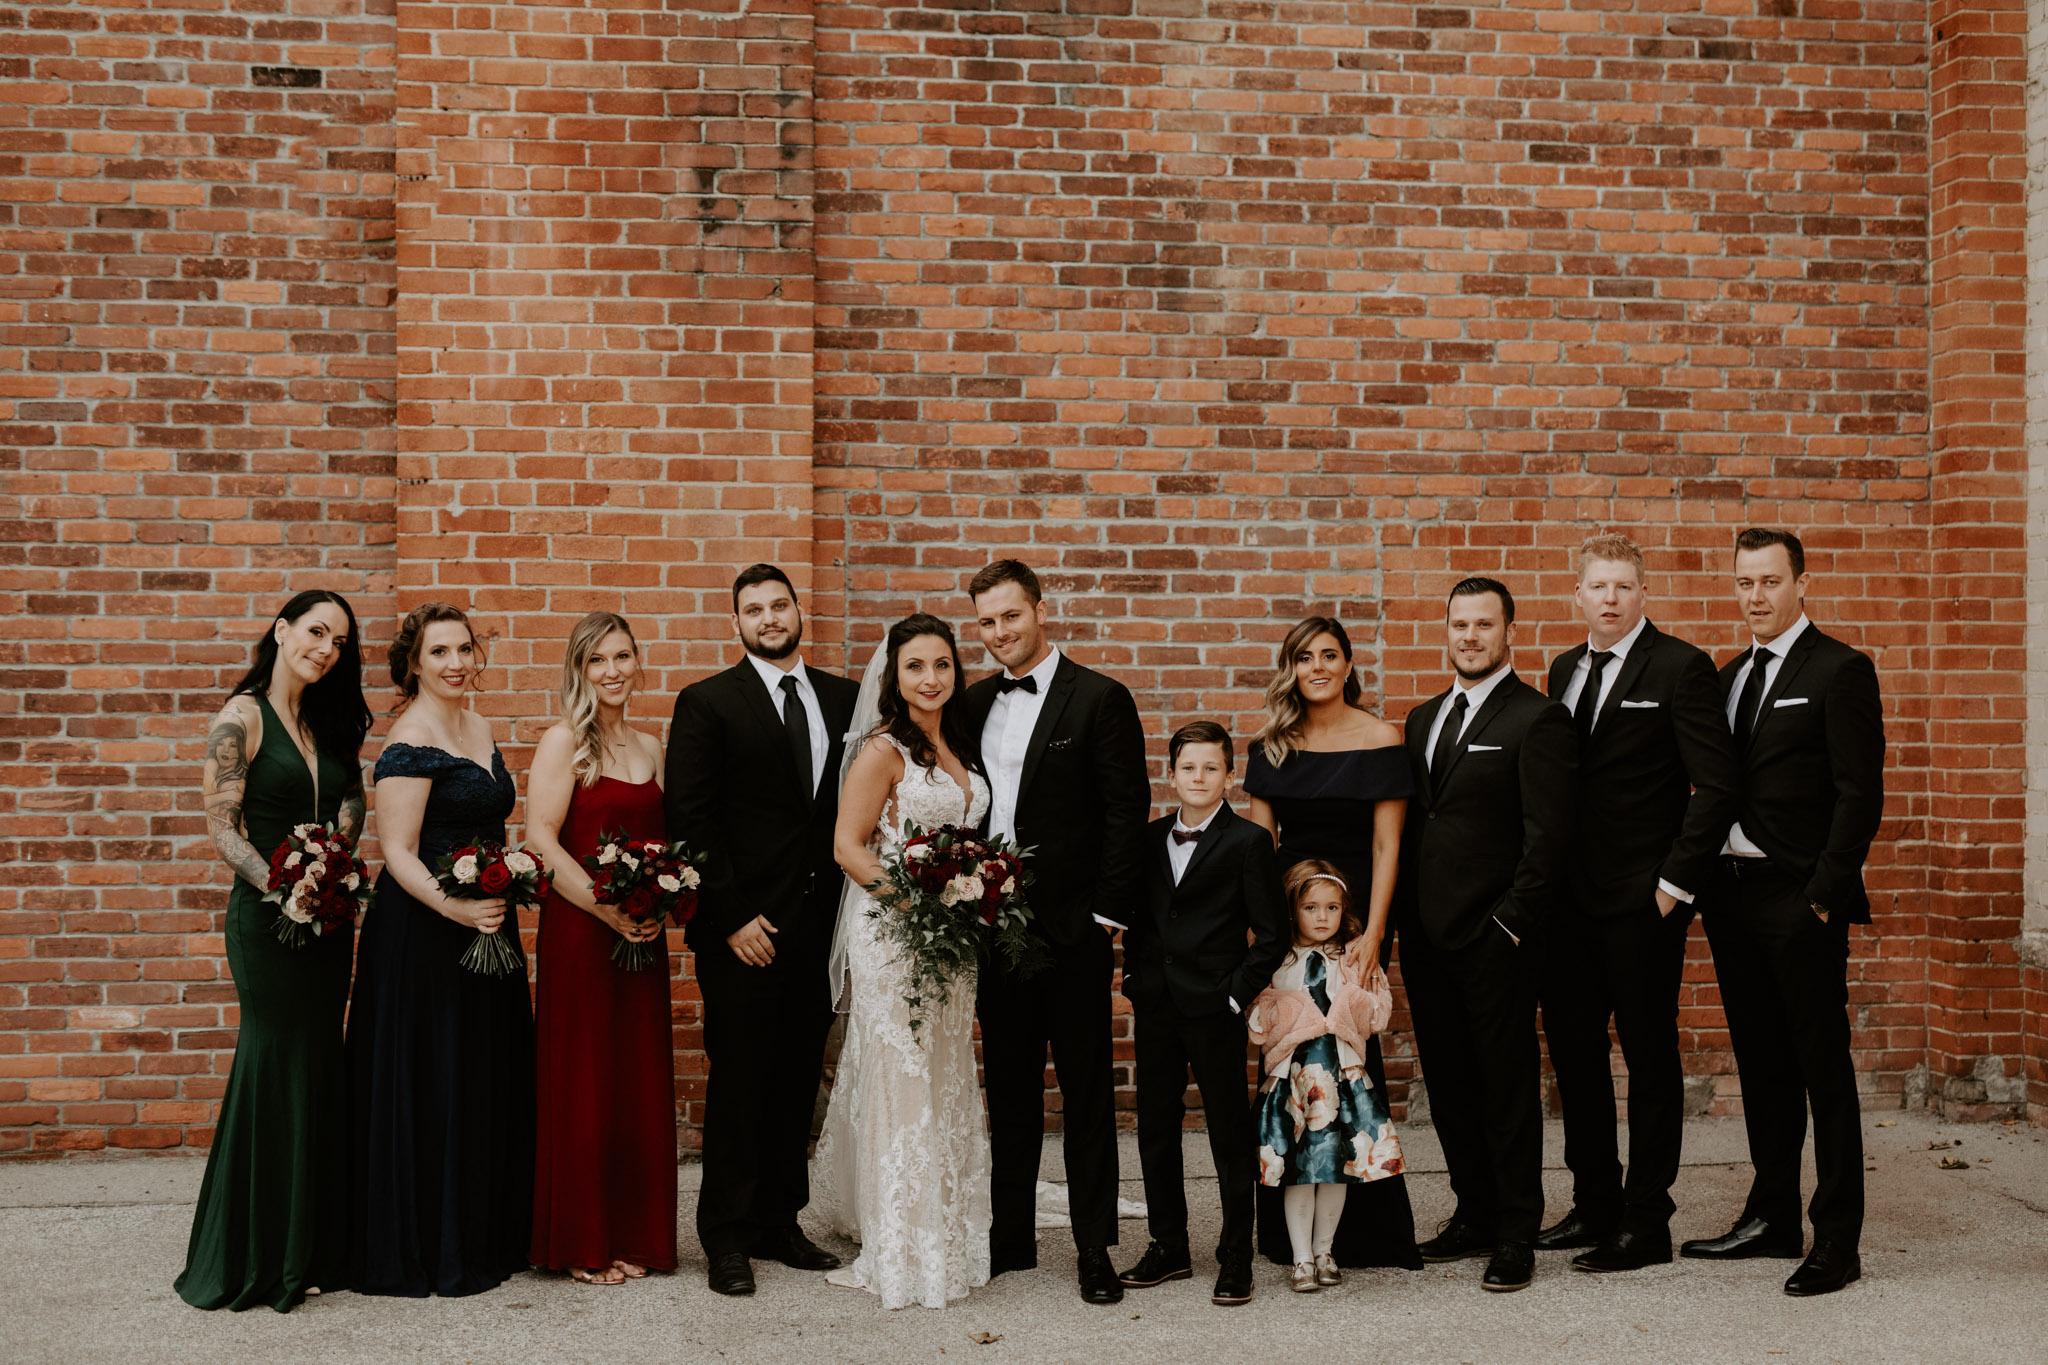 Liberty Village Wedding - wedding party portrait